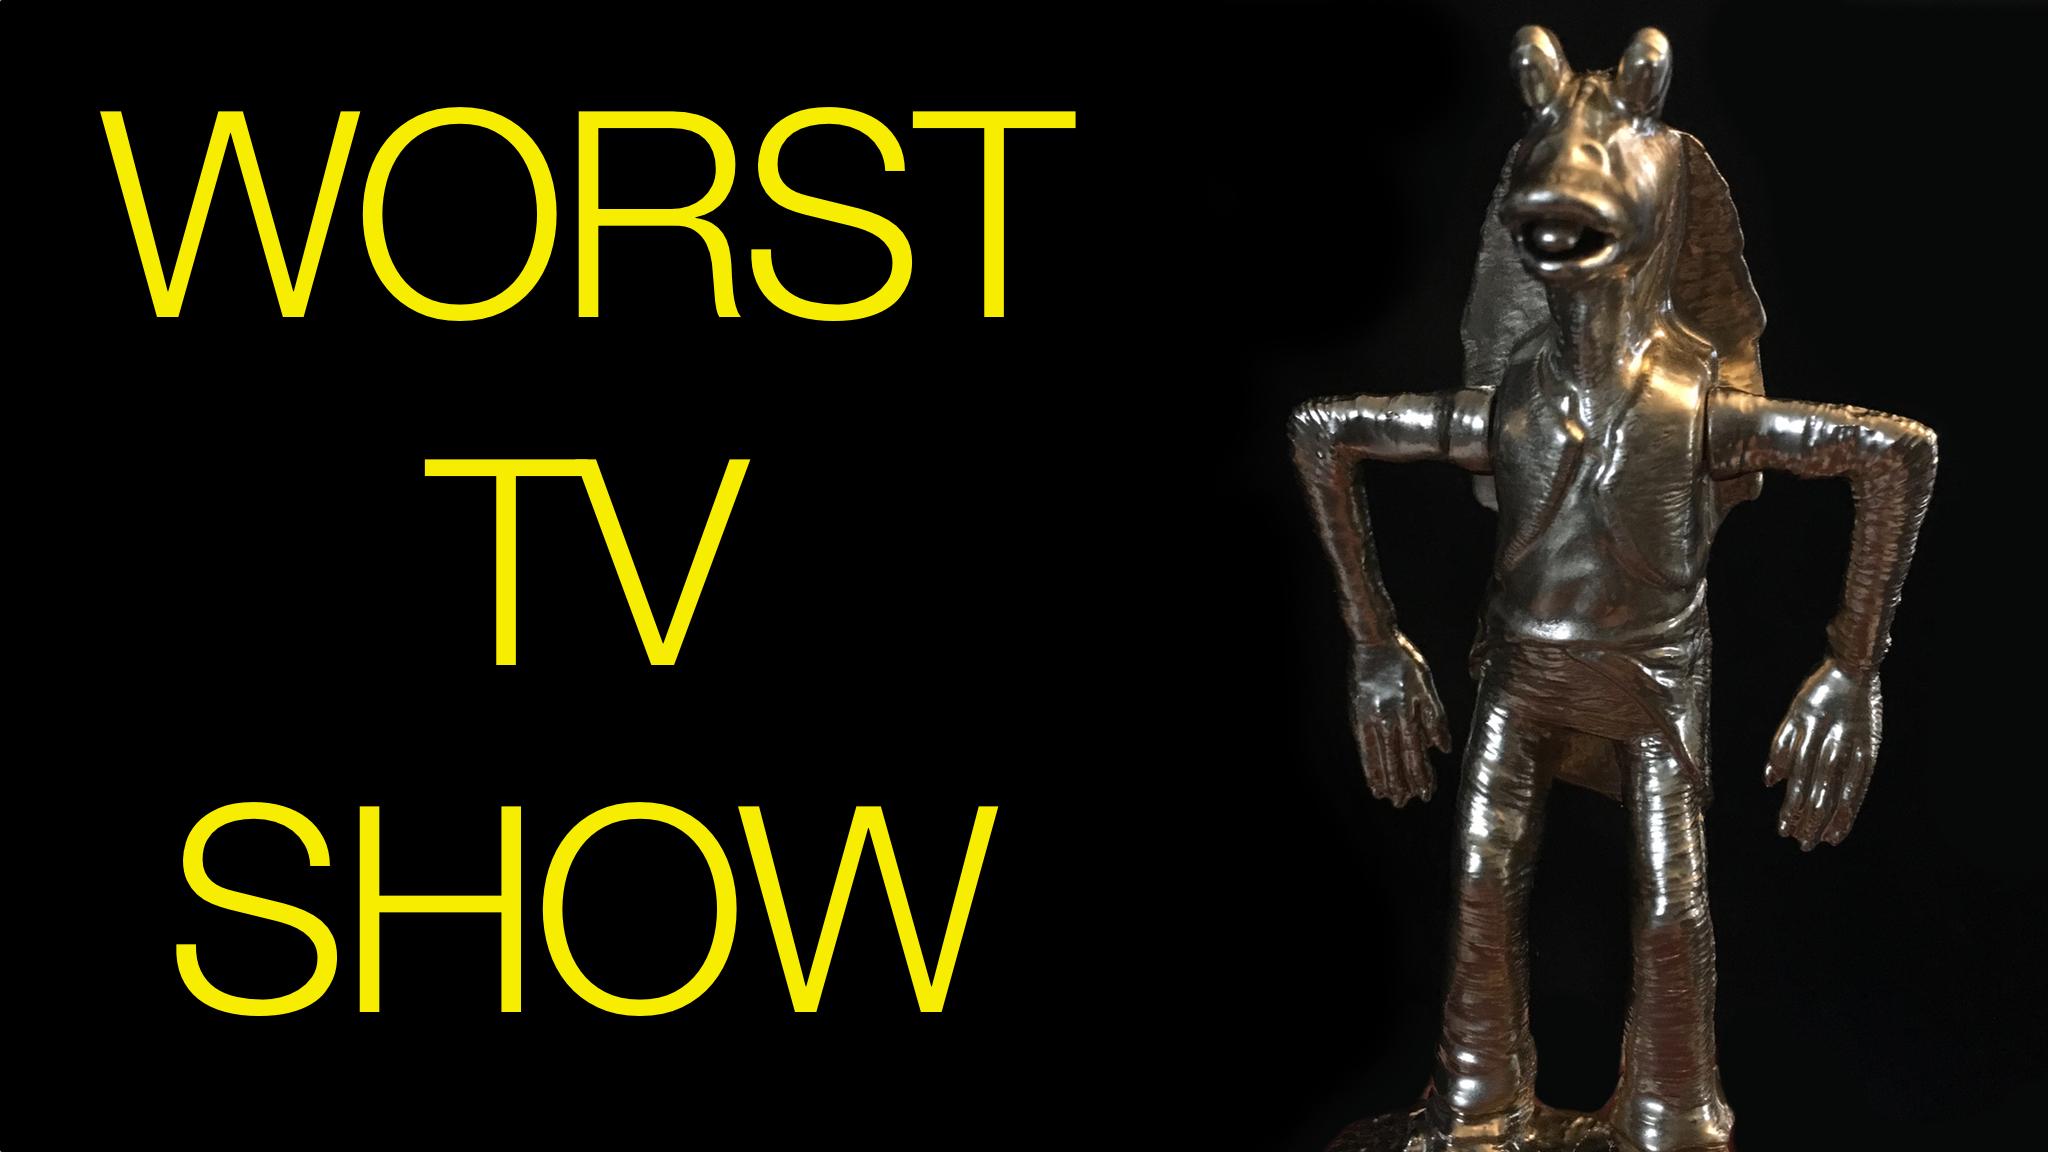 WORST TV 2048X1152.jpg